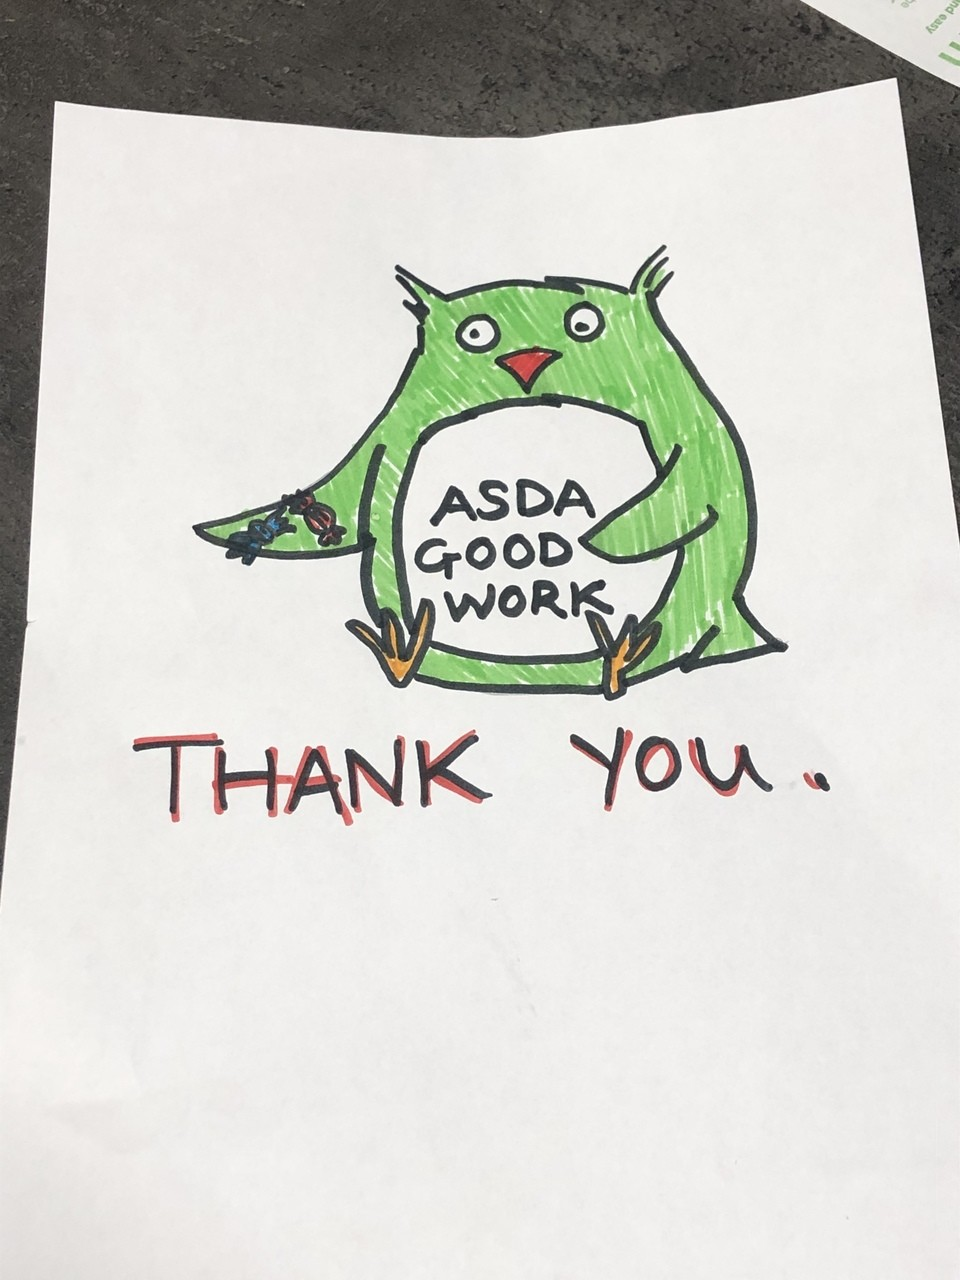 Making our colleagues smile | Asda Charlton